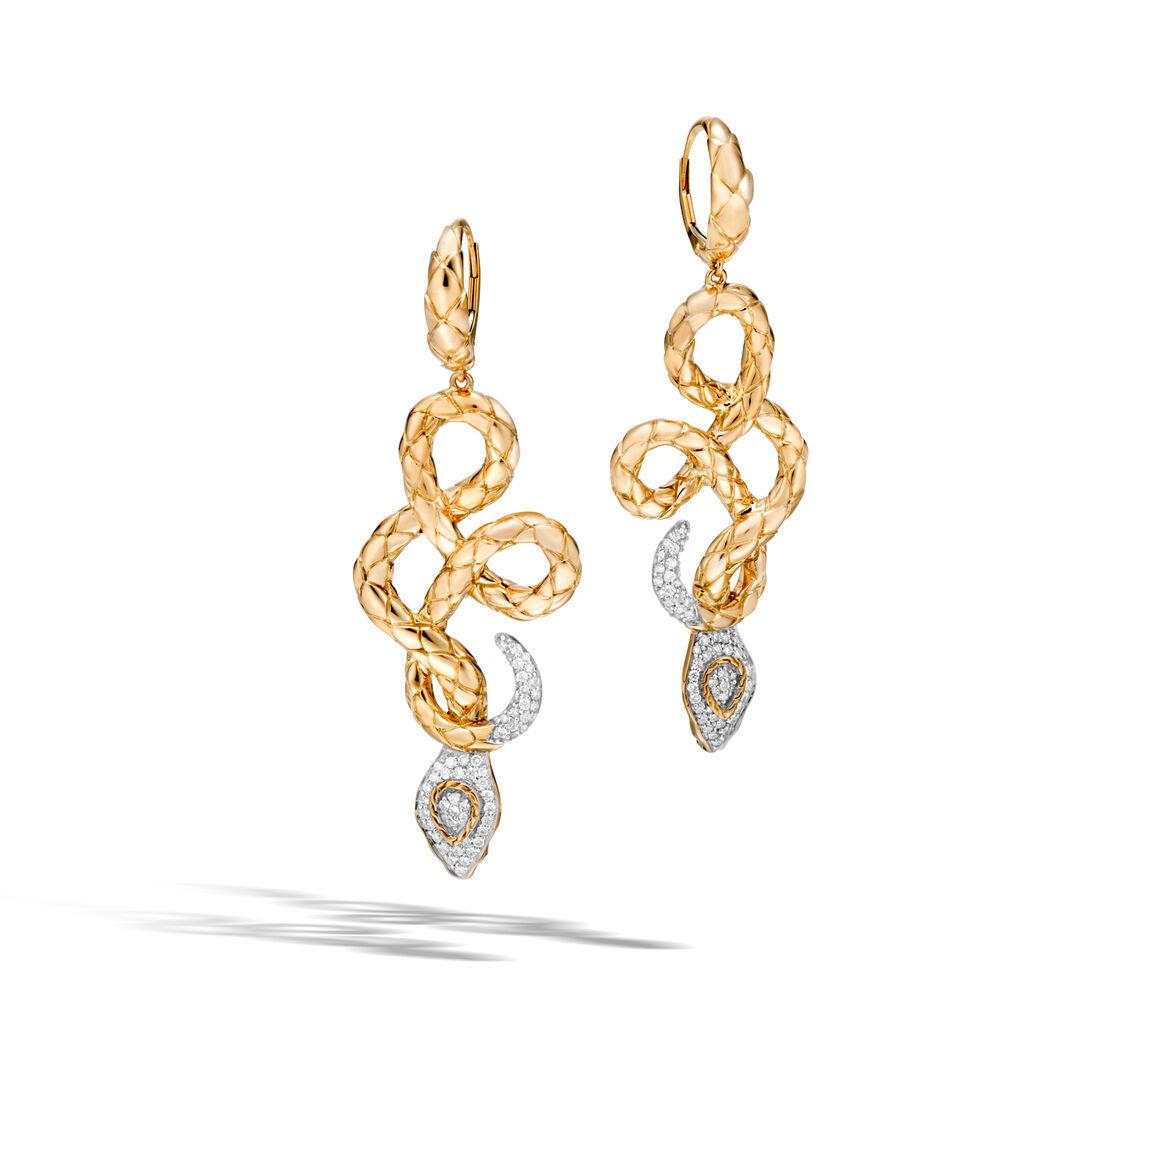 Legends Cobra Drop Earring in 18K Gold with Diamonds